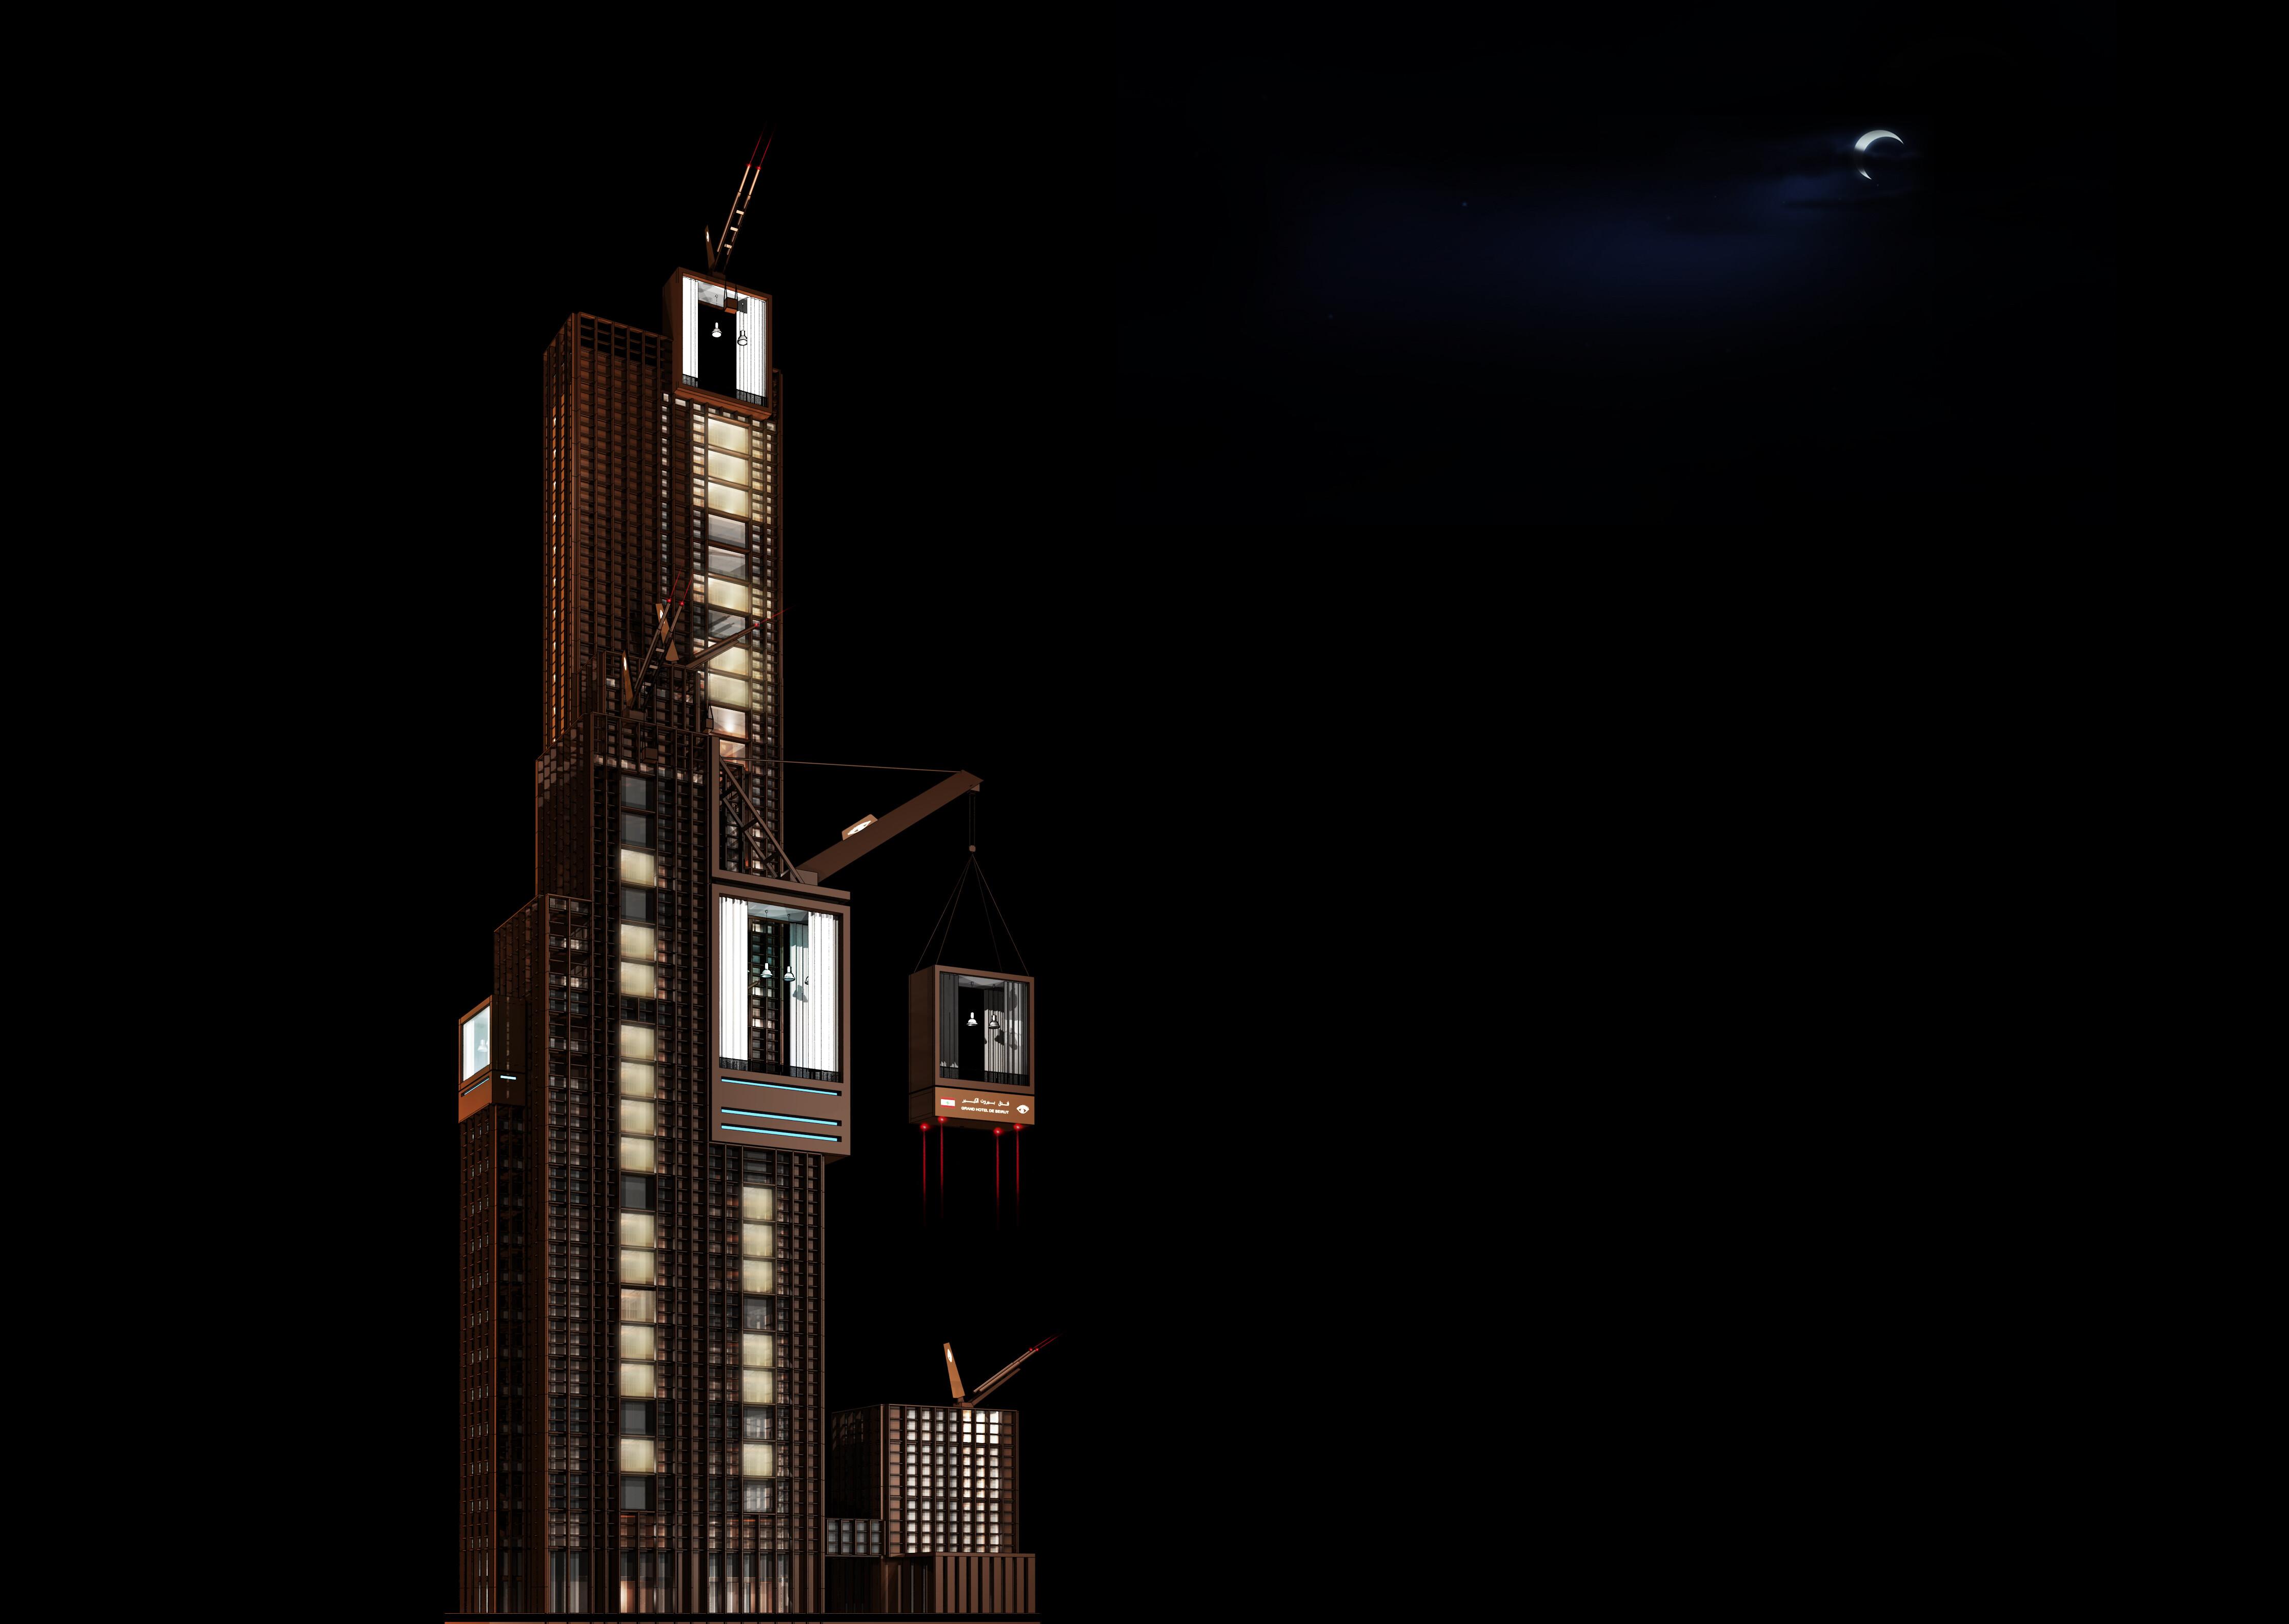 Grand Hotel de Beirut (Plot # 450 Saifi)